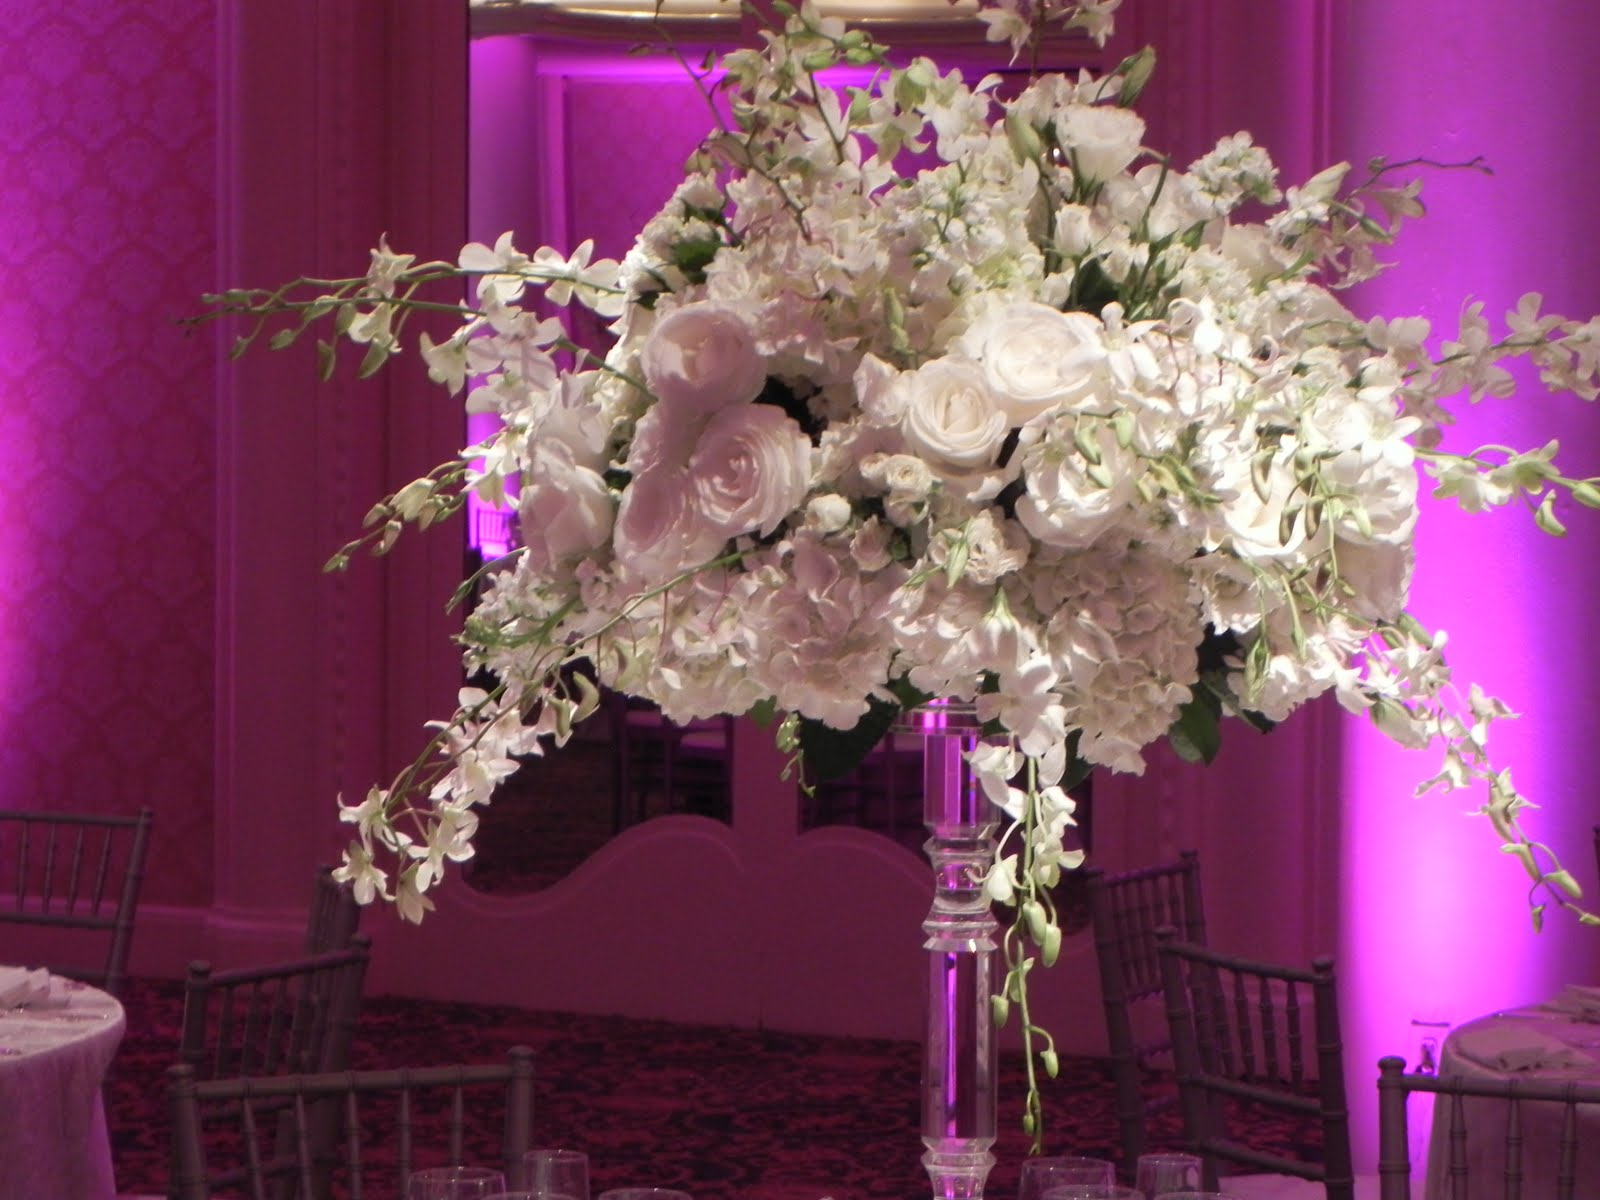 beach-wedding-decoration-ideas wedding centerpieces with lamps